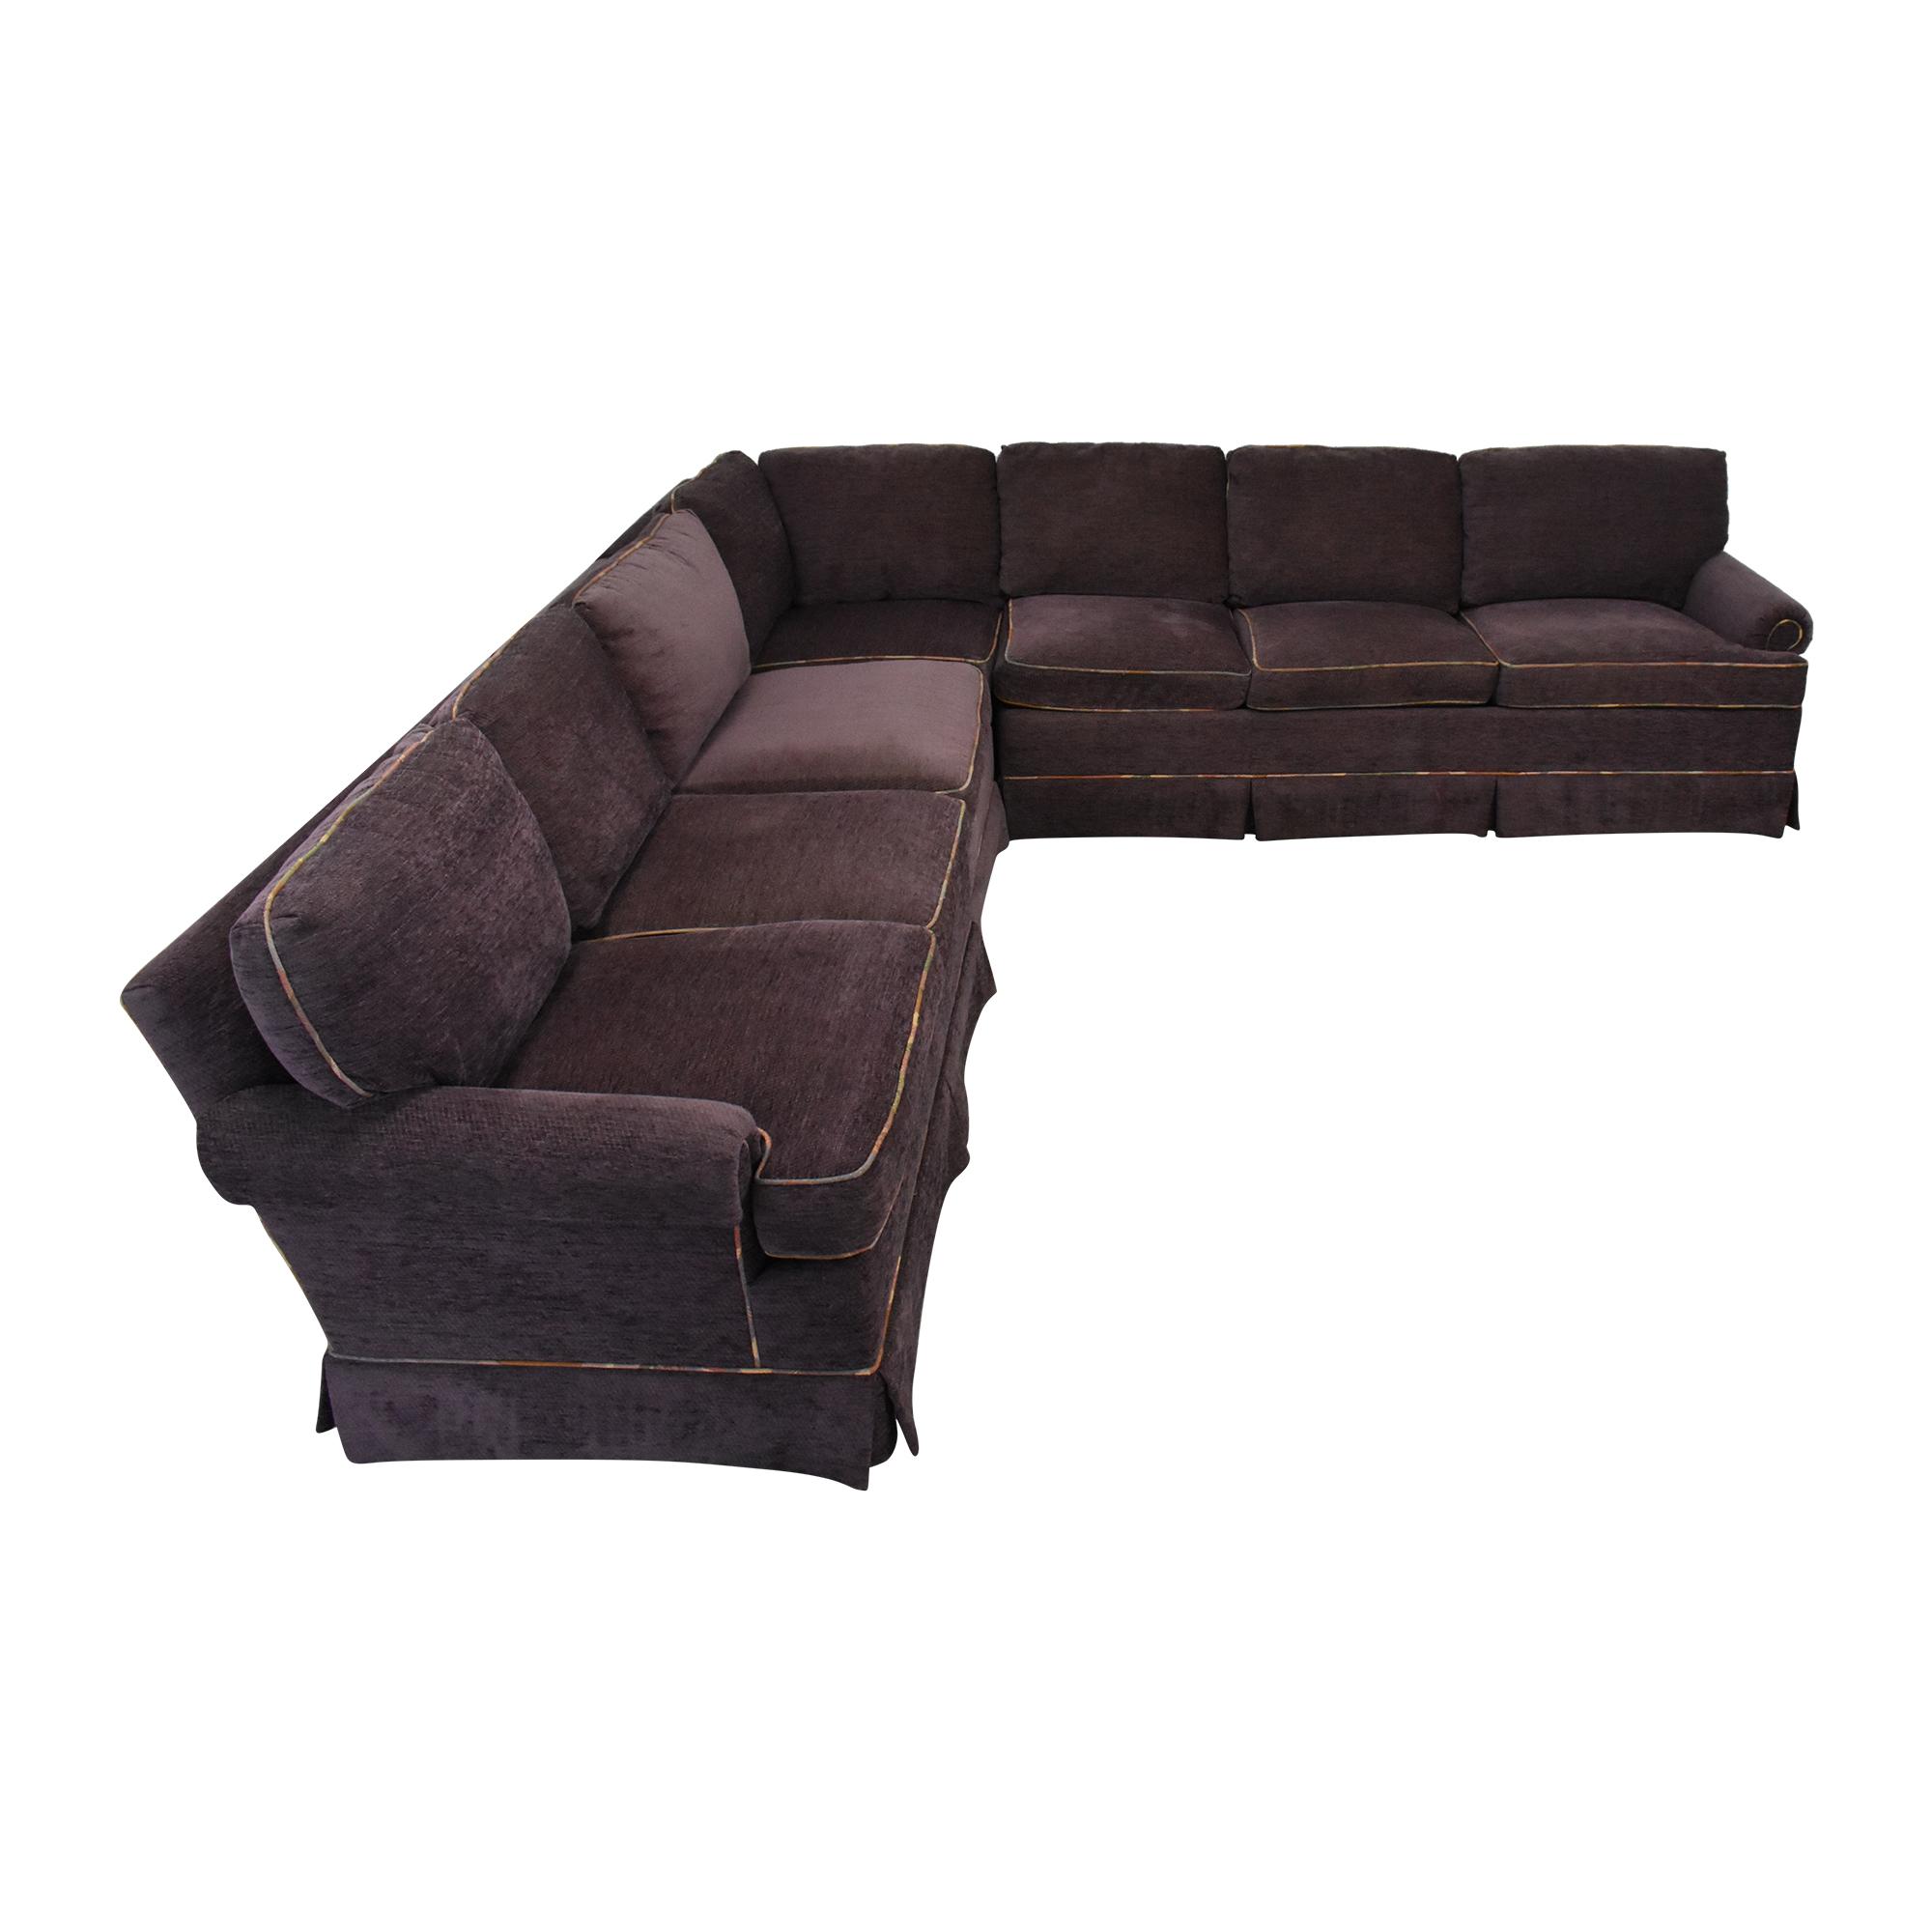 Charles Stewart Company L Shaped Sectional Sofa / Sofas